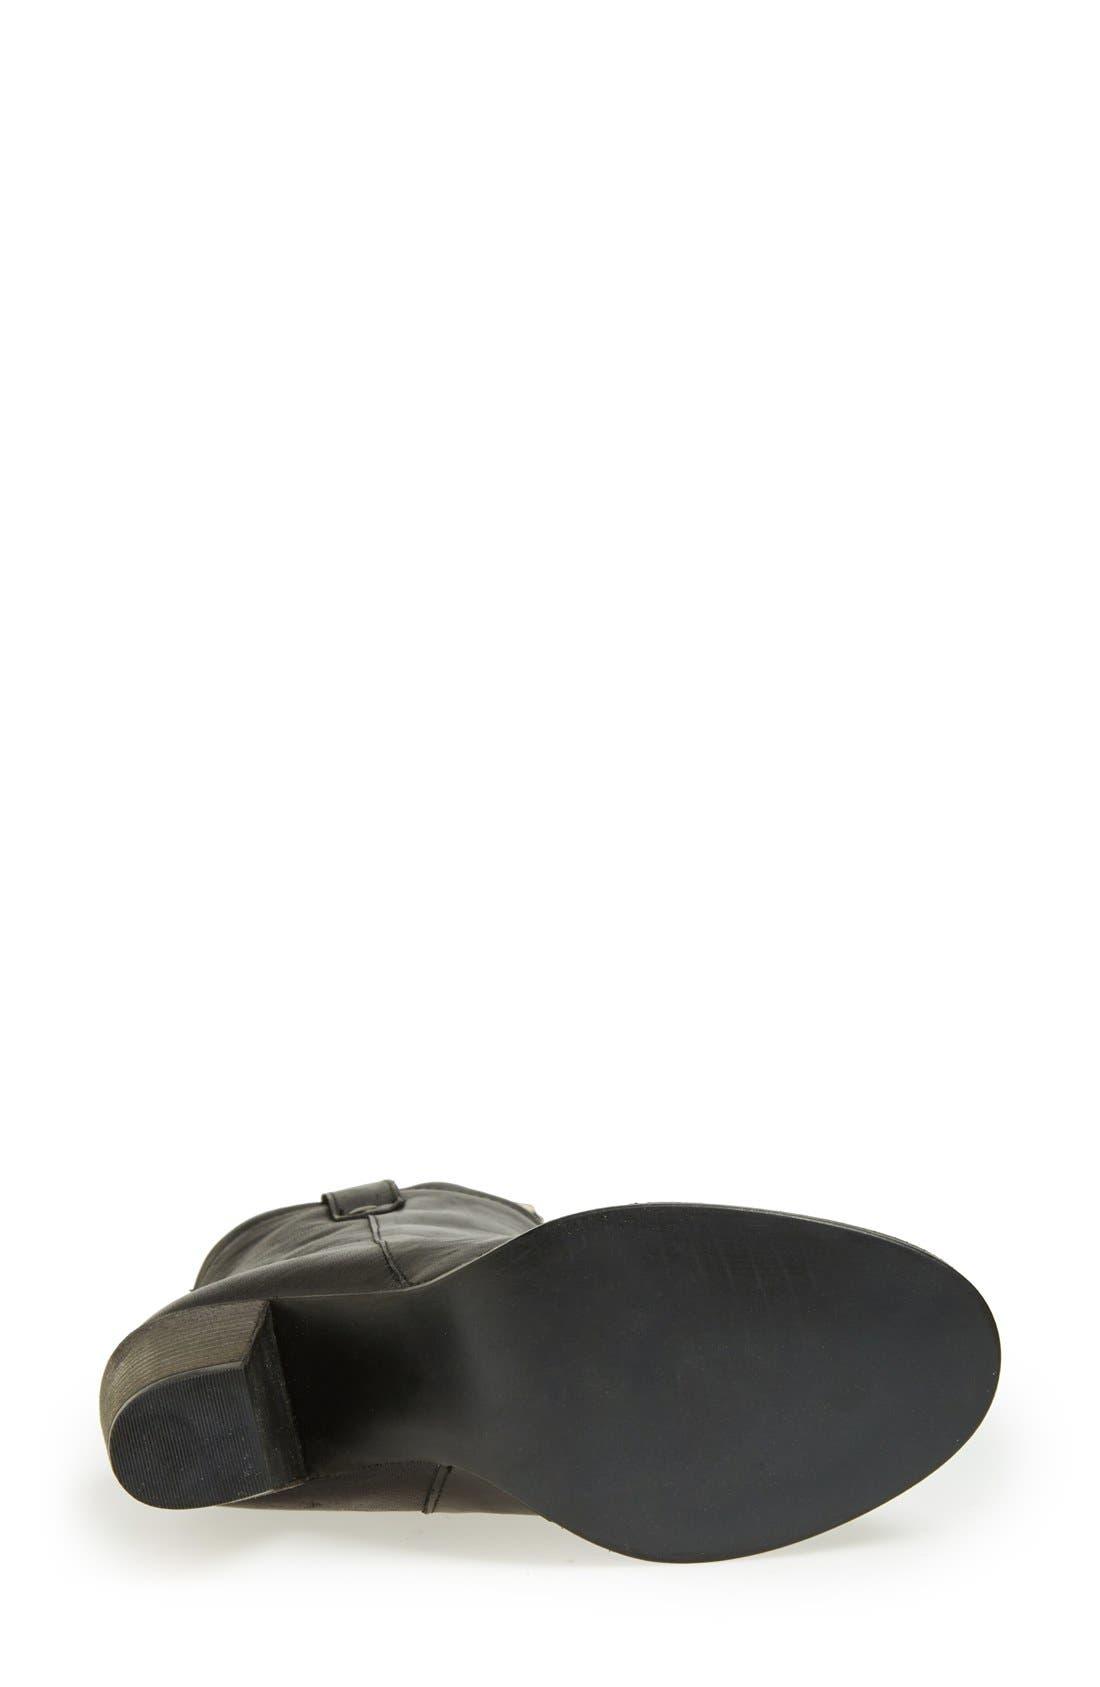 'Taralyn' Leather Boot,                             Alternate thumbnail 2, color,                             002